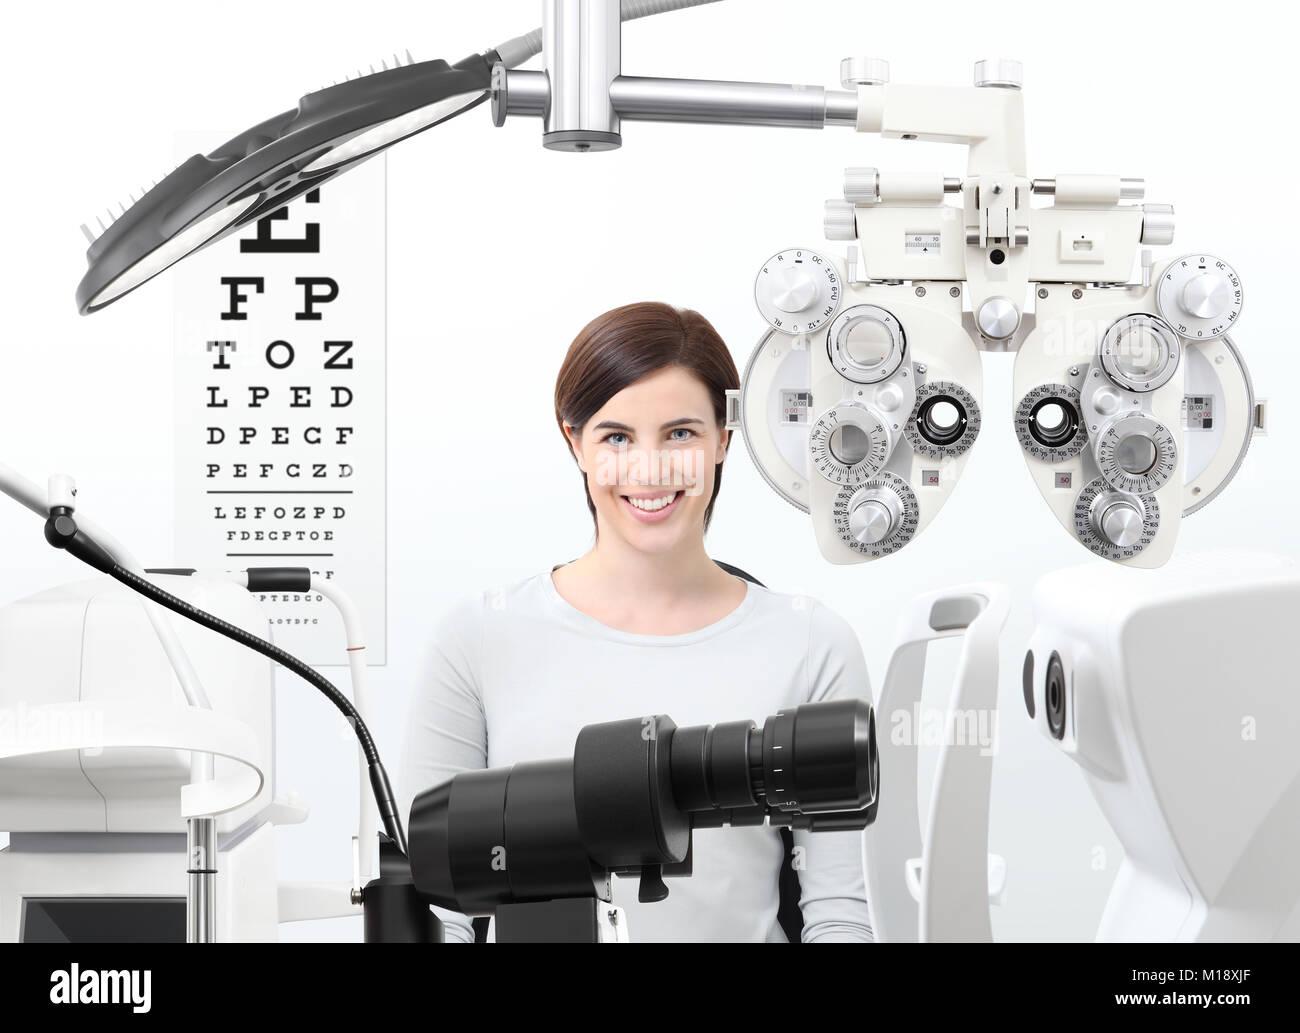 optometrist exam, eyesight  woman patient in optician office - Stock Image